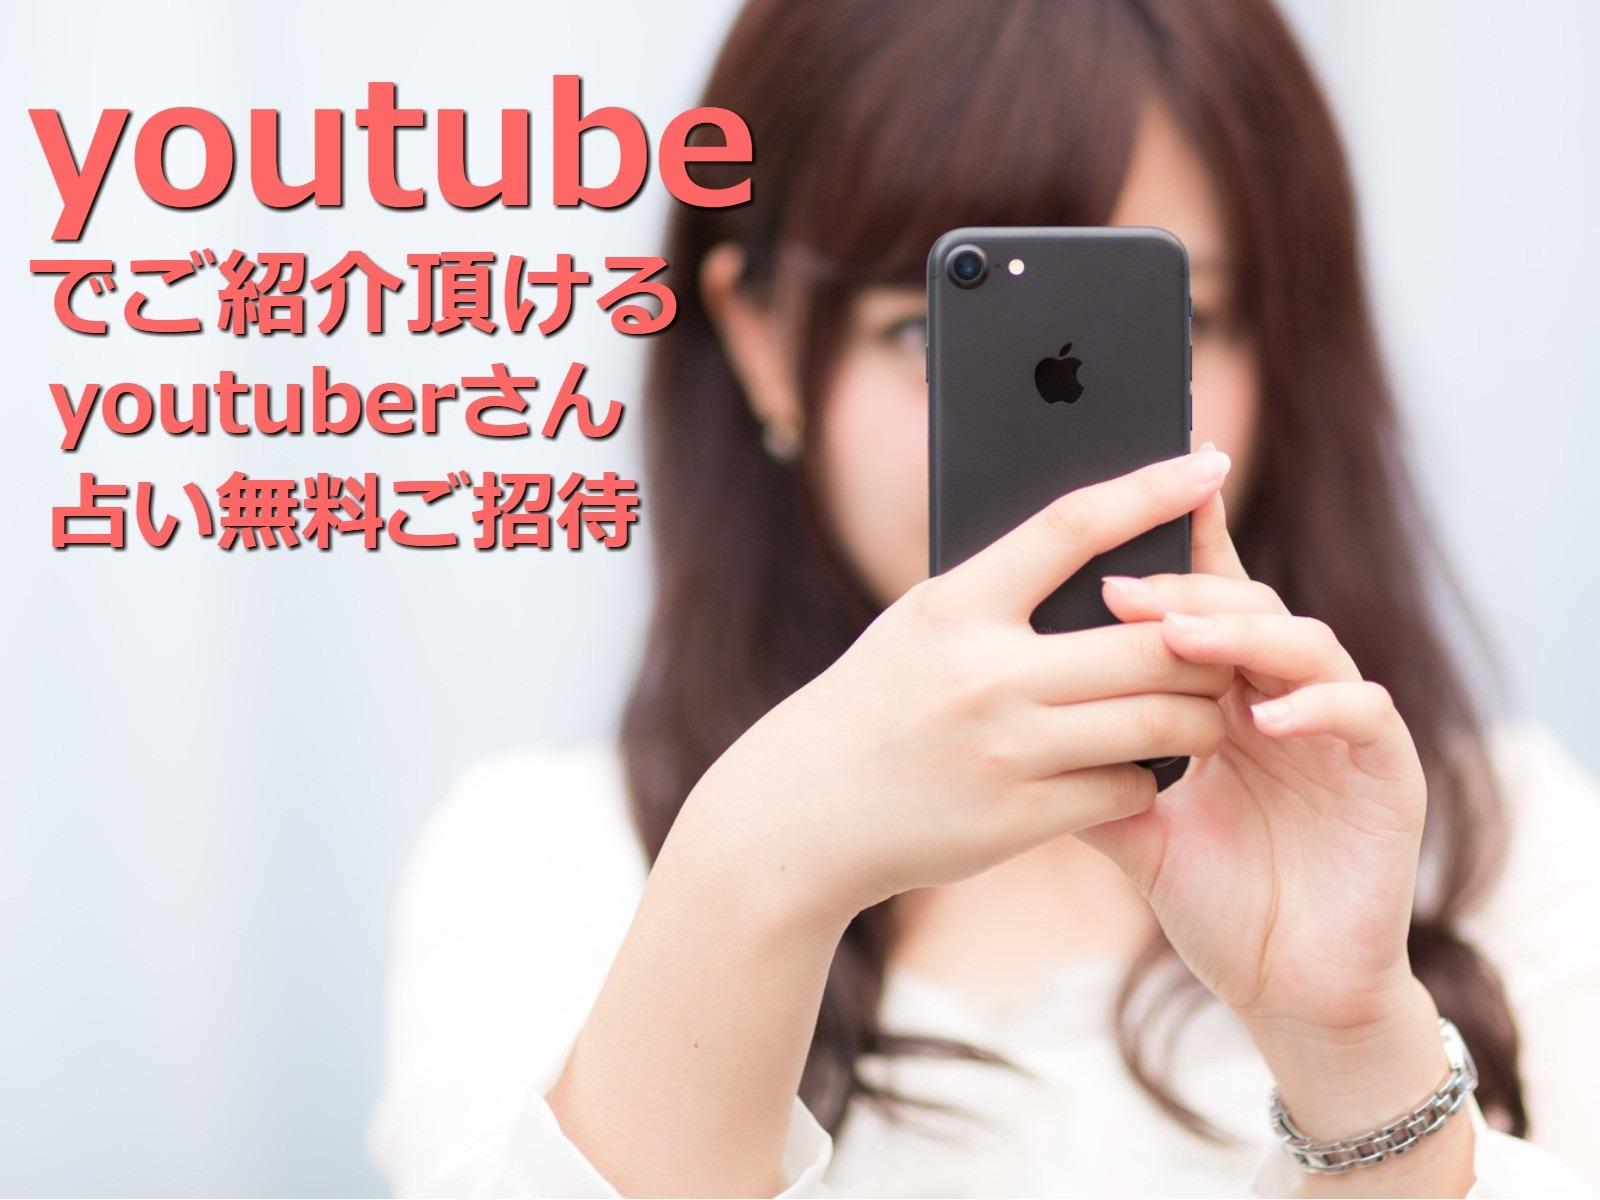 youtubeに占いコンテンツ活用の企画をしたいなら【youtuber限定・個室占い15分無料モニター】を試してみませんか?個室なので撮影しやすいです。